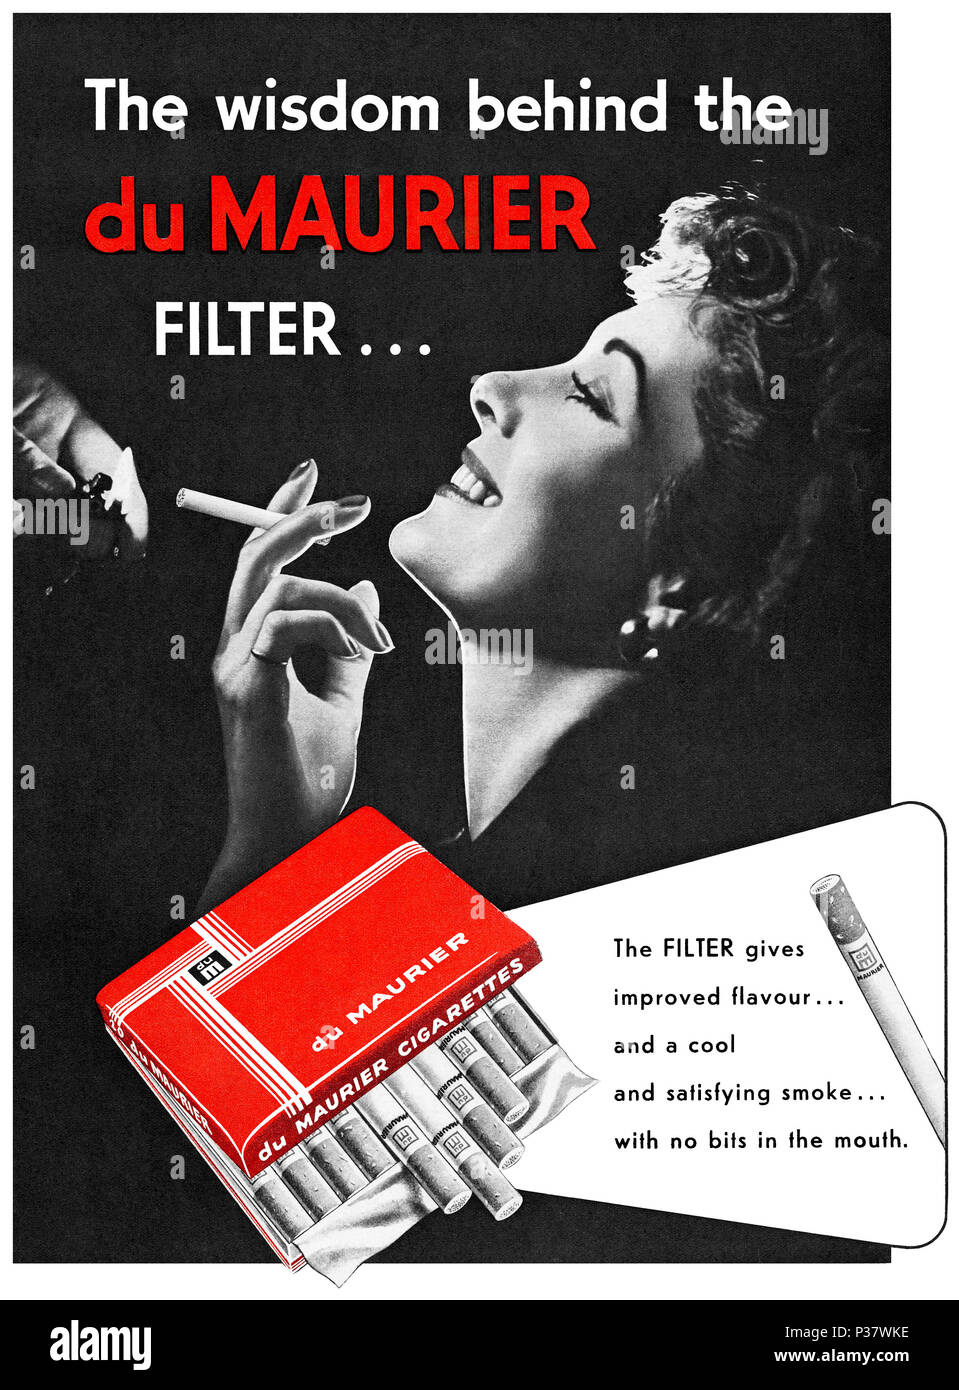 1952 British advertisement for du Maurier filter cigarettes. - Stock Image